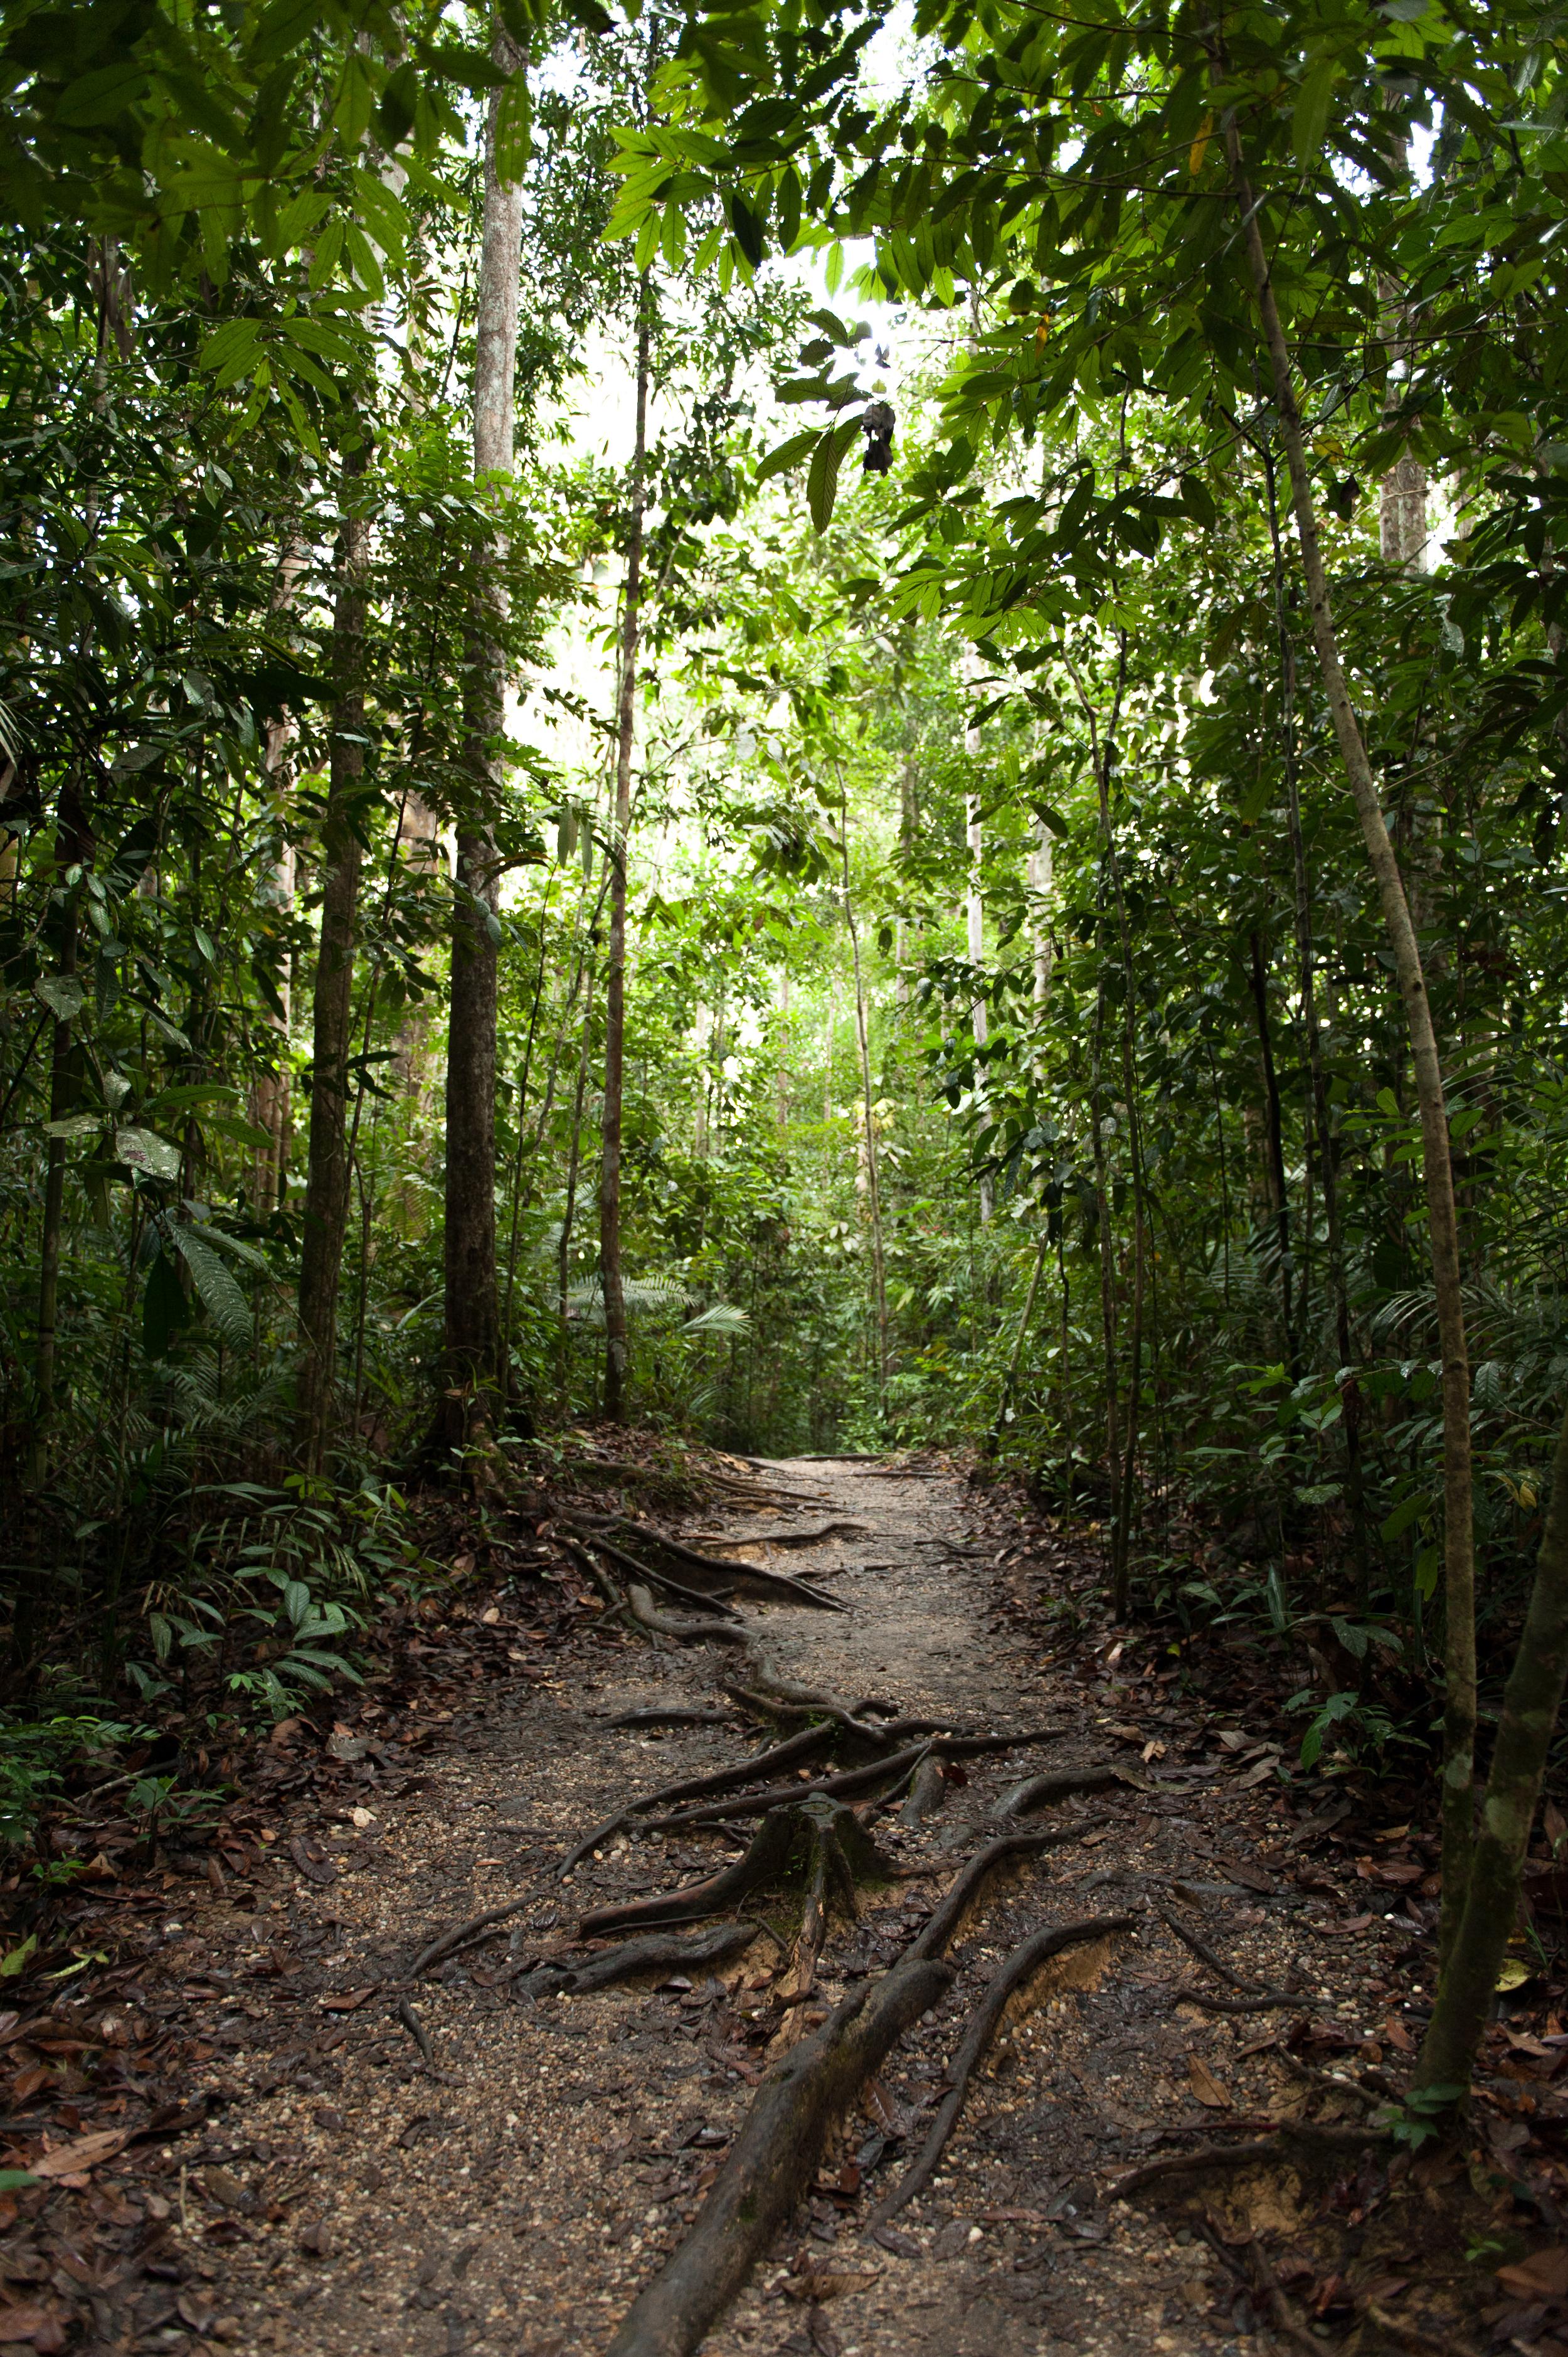 BorneoMalaysiaAugust2015 (30 of 166).jpg